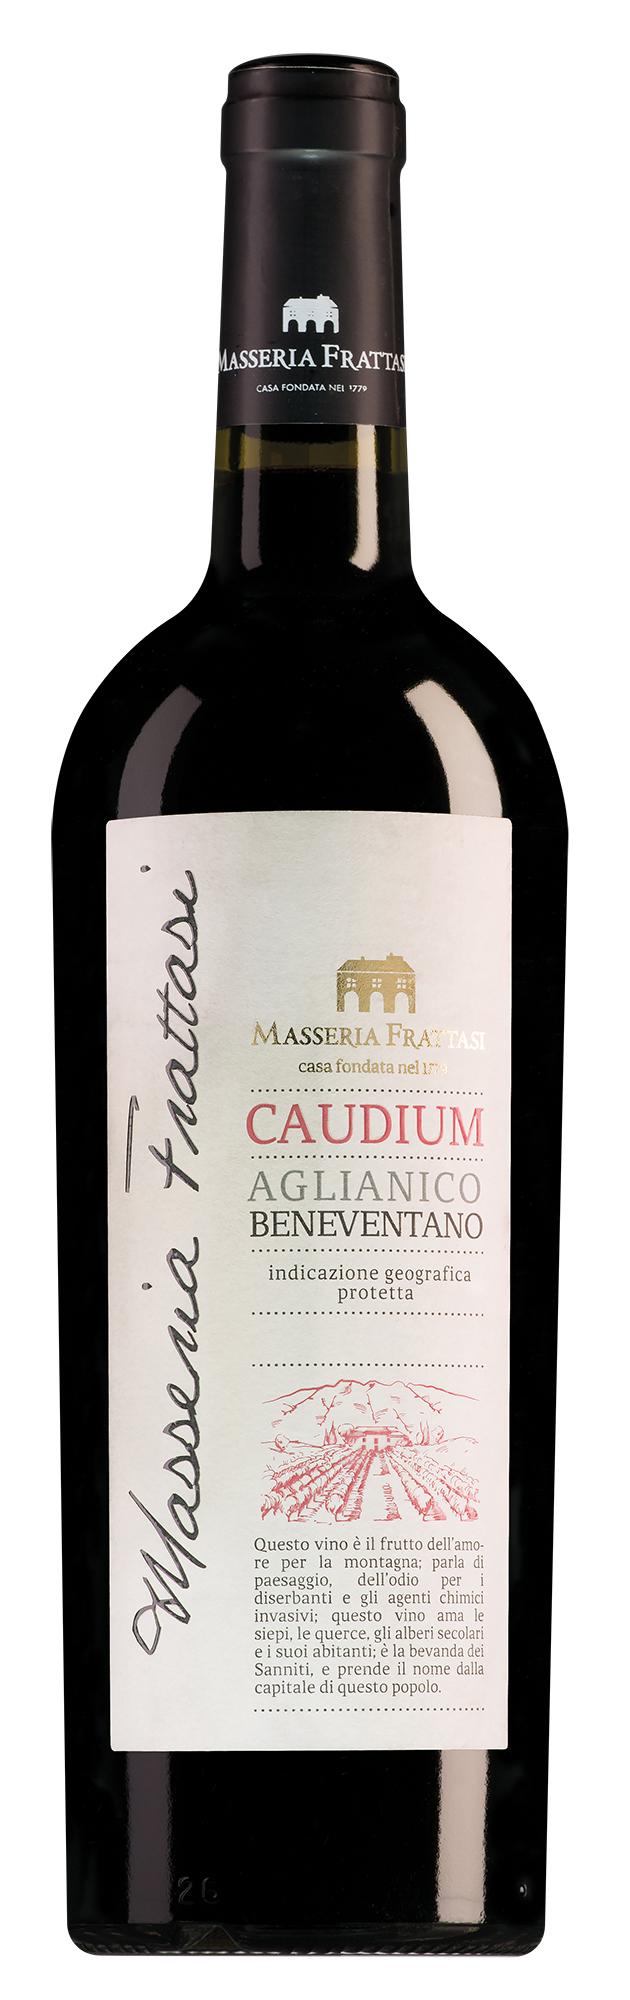 Masseria Frattasi Beneventano Campania Caudium Aglianico